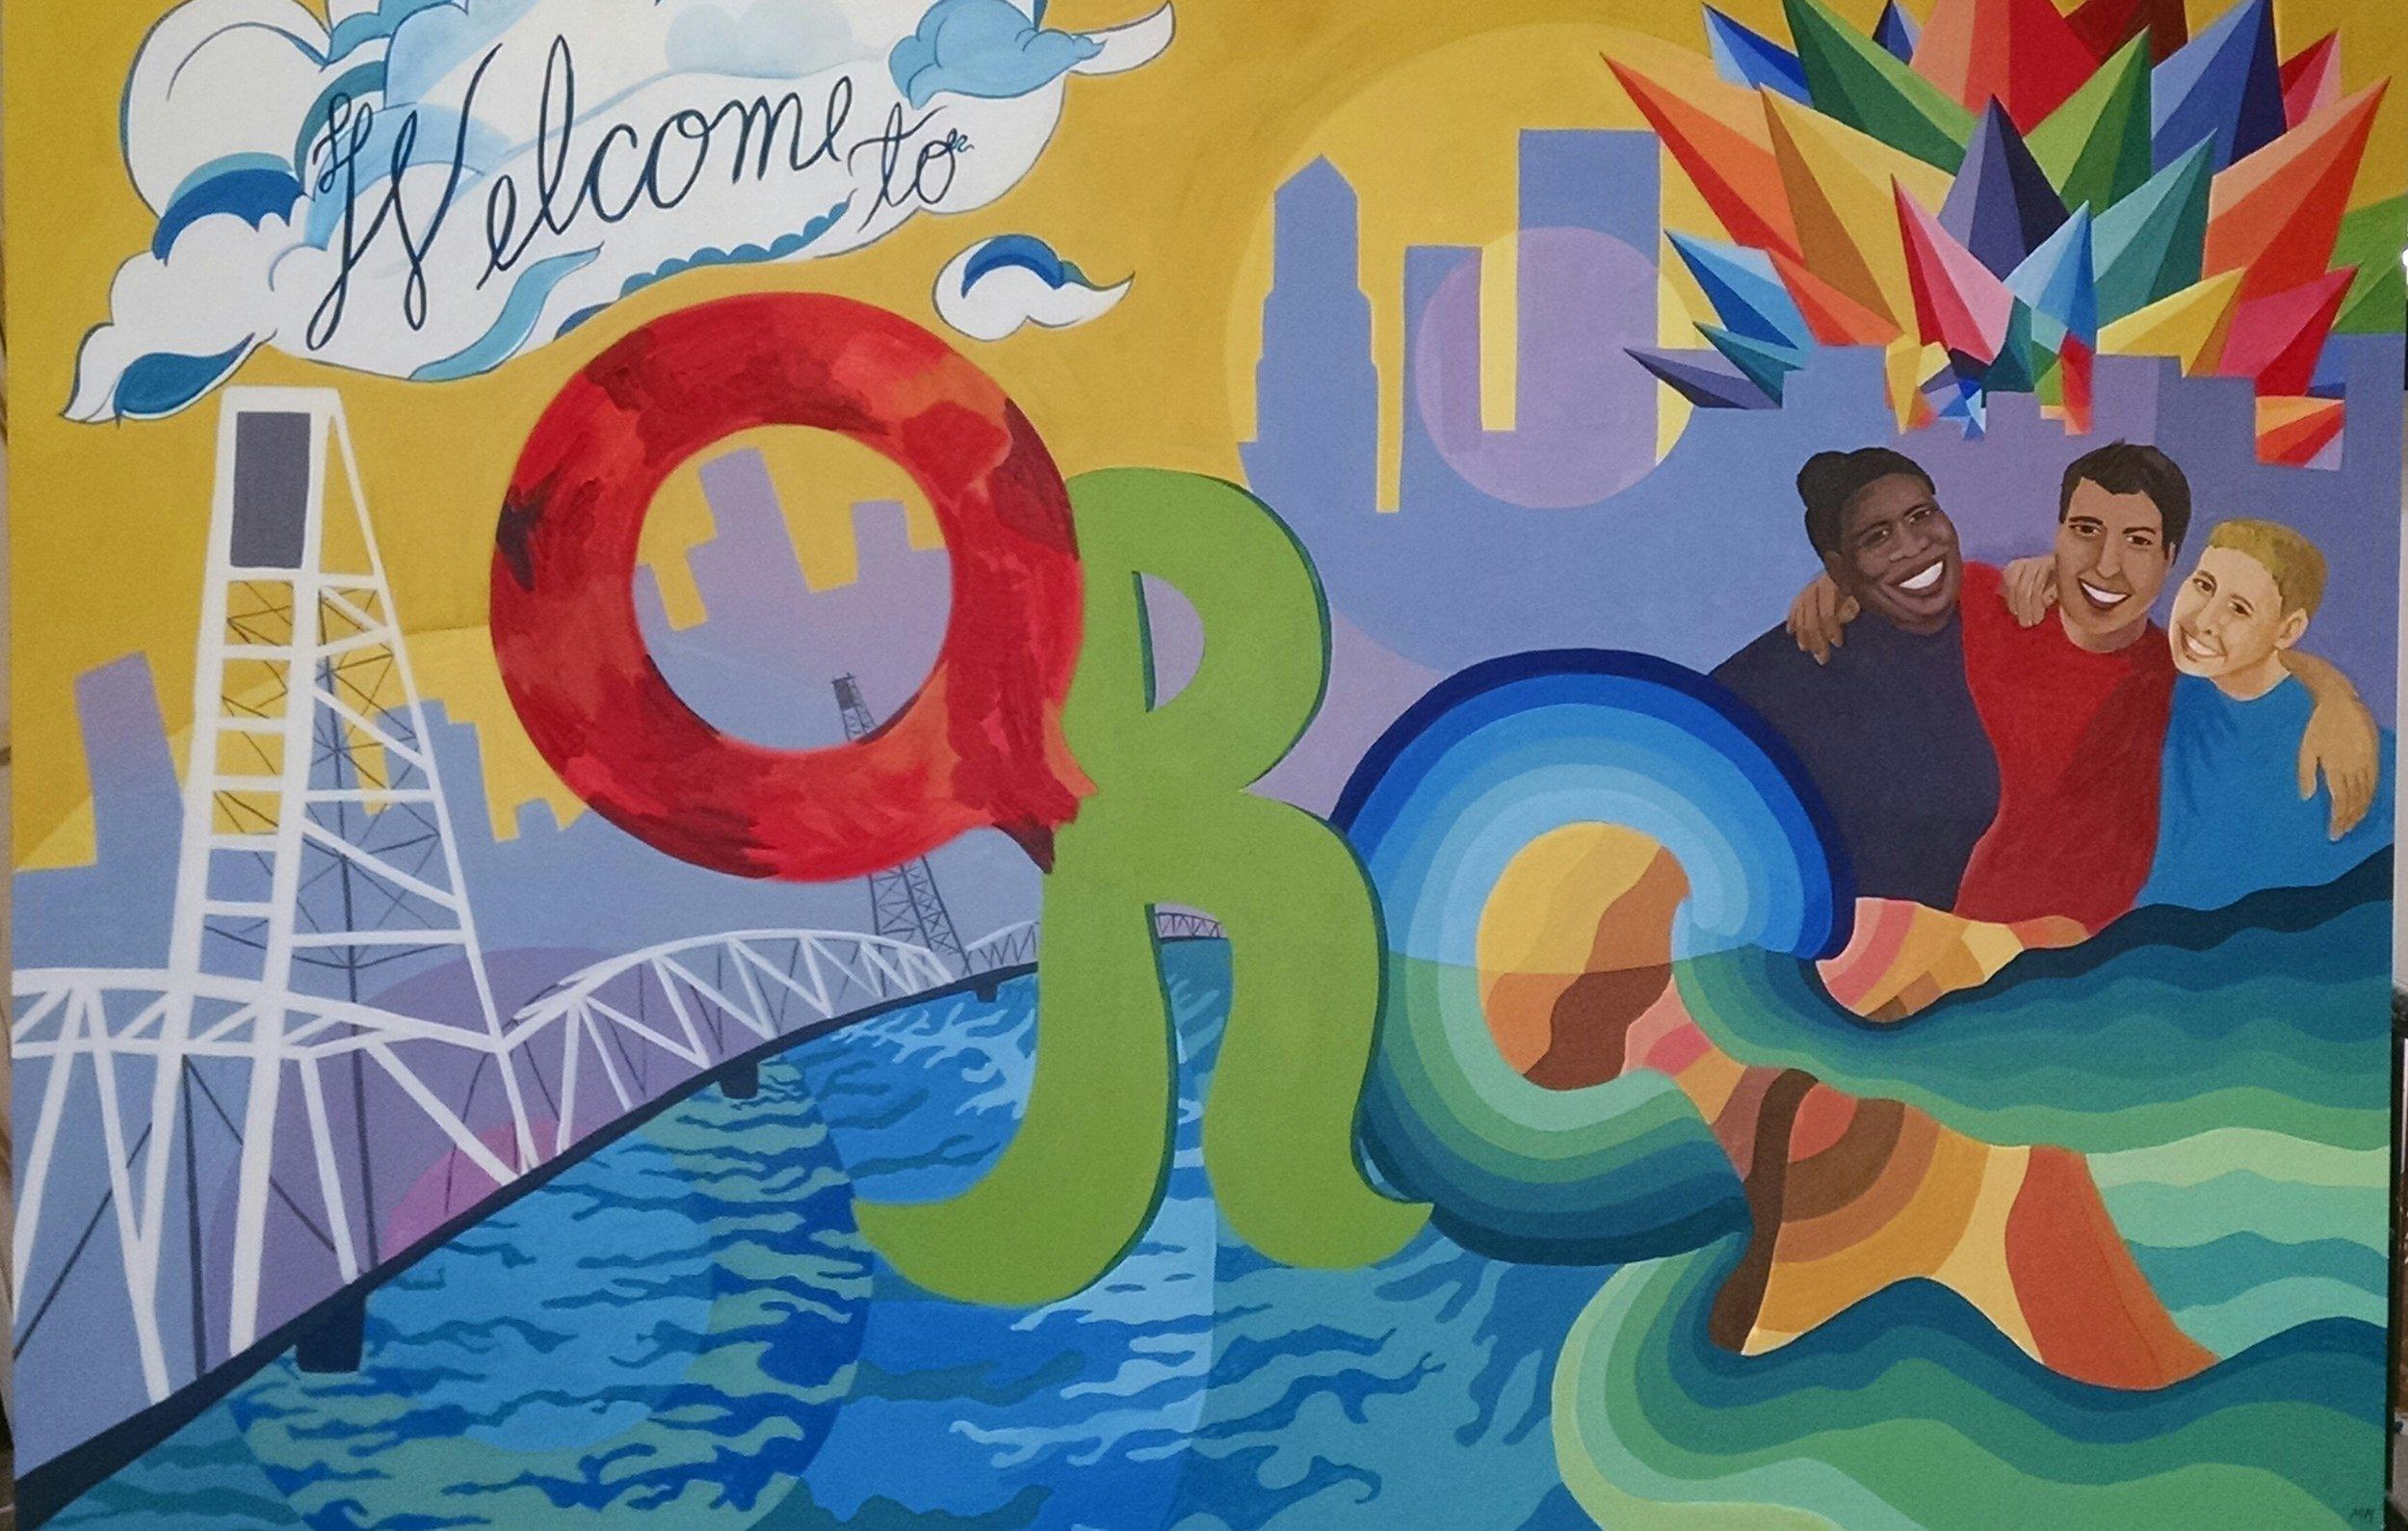 PSU Queer Student Resource Center Mural